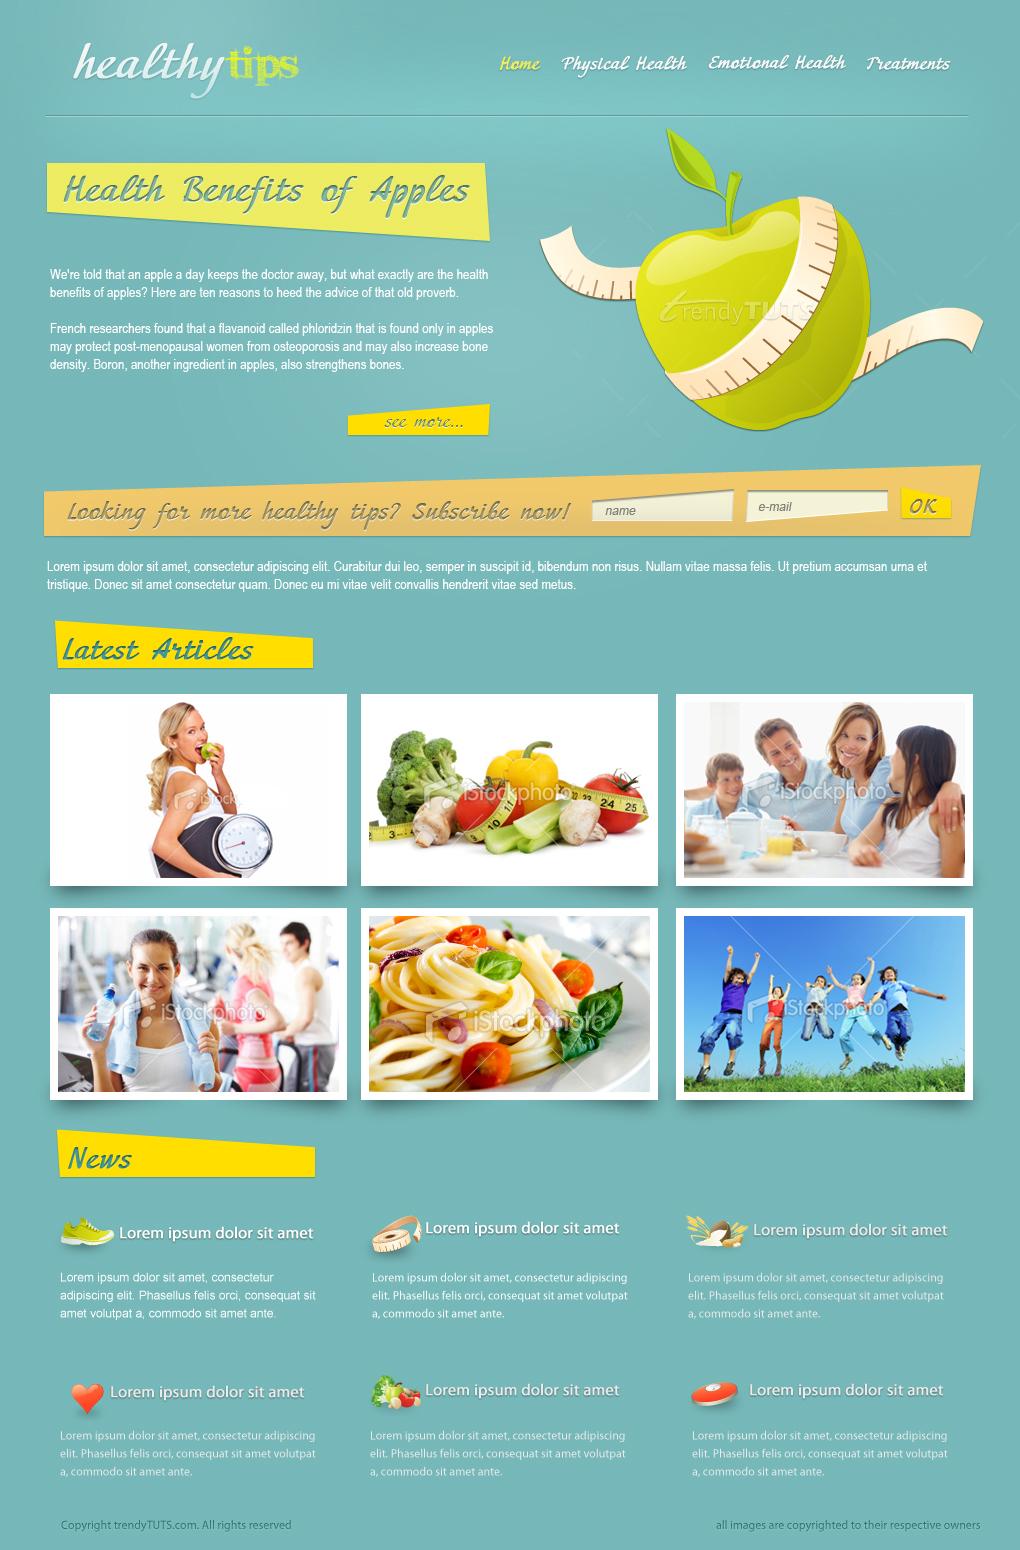 Web design tutorss march 2013 photoshop web design tutorials baditri Choice Image